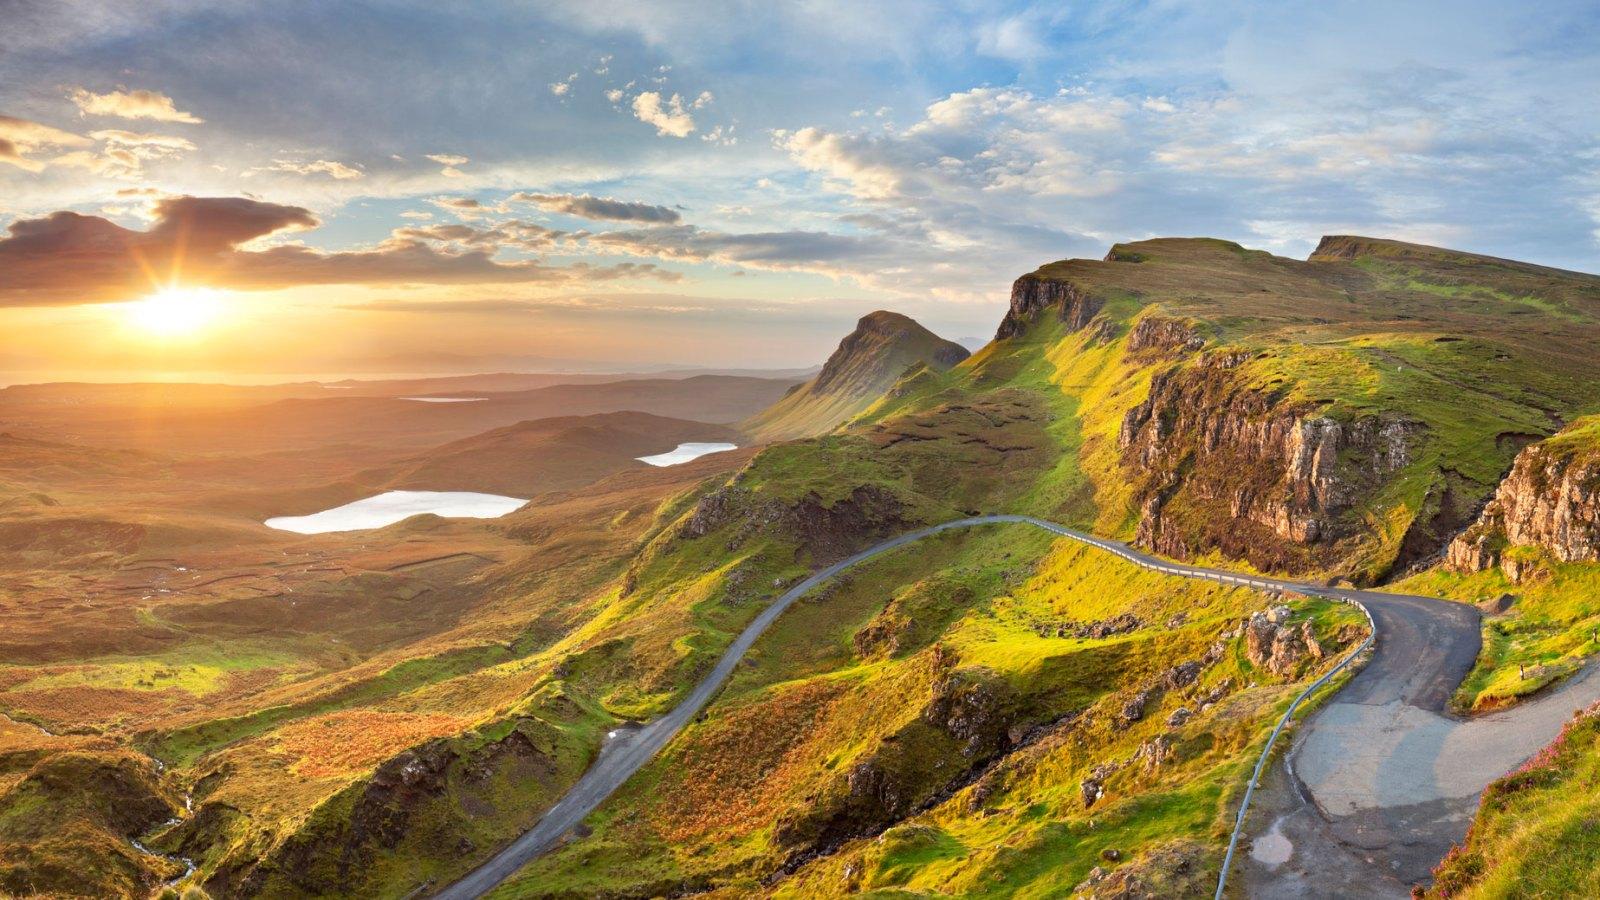 Sunrise at Quiraing Isle of Skye Scotland